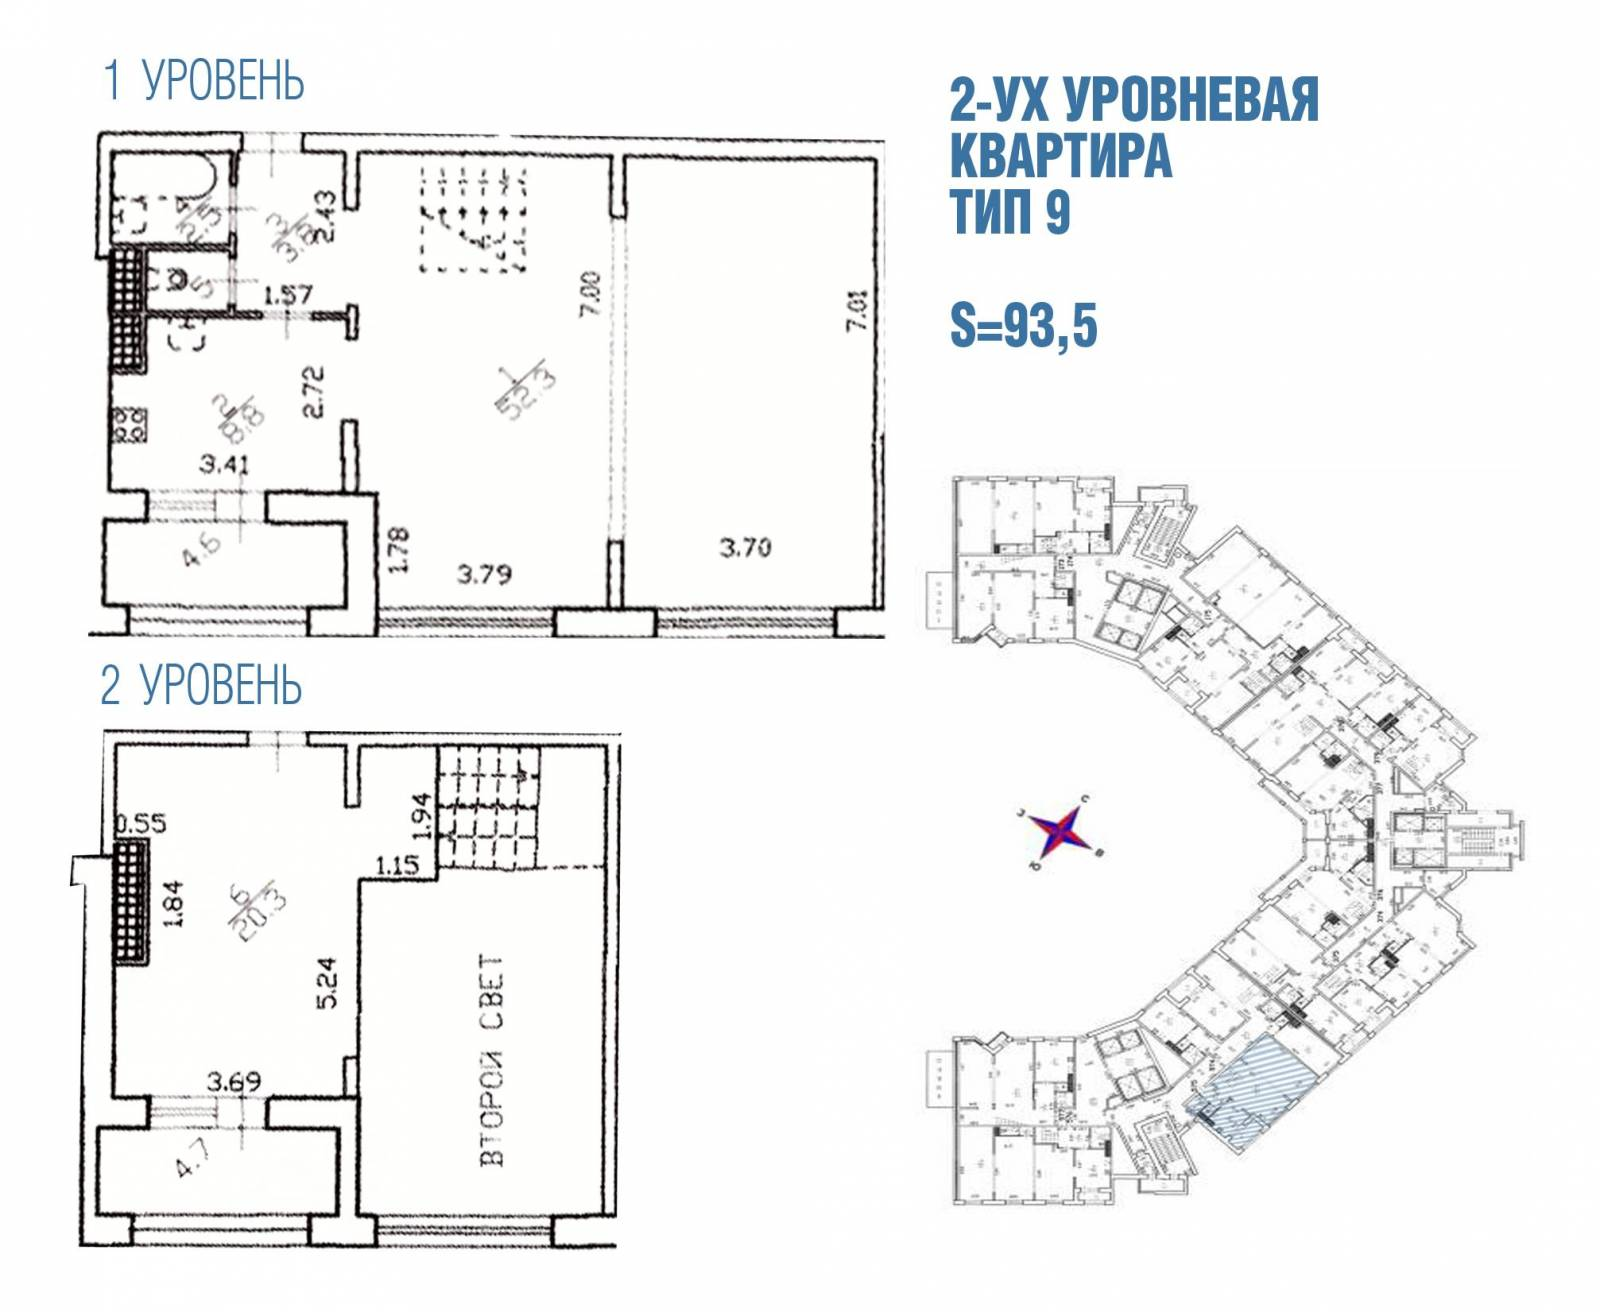 Двухуровневая квартира тип 9 S=93,5